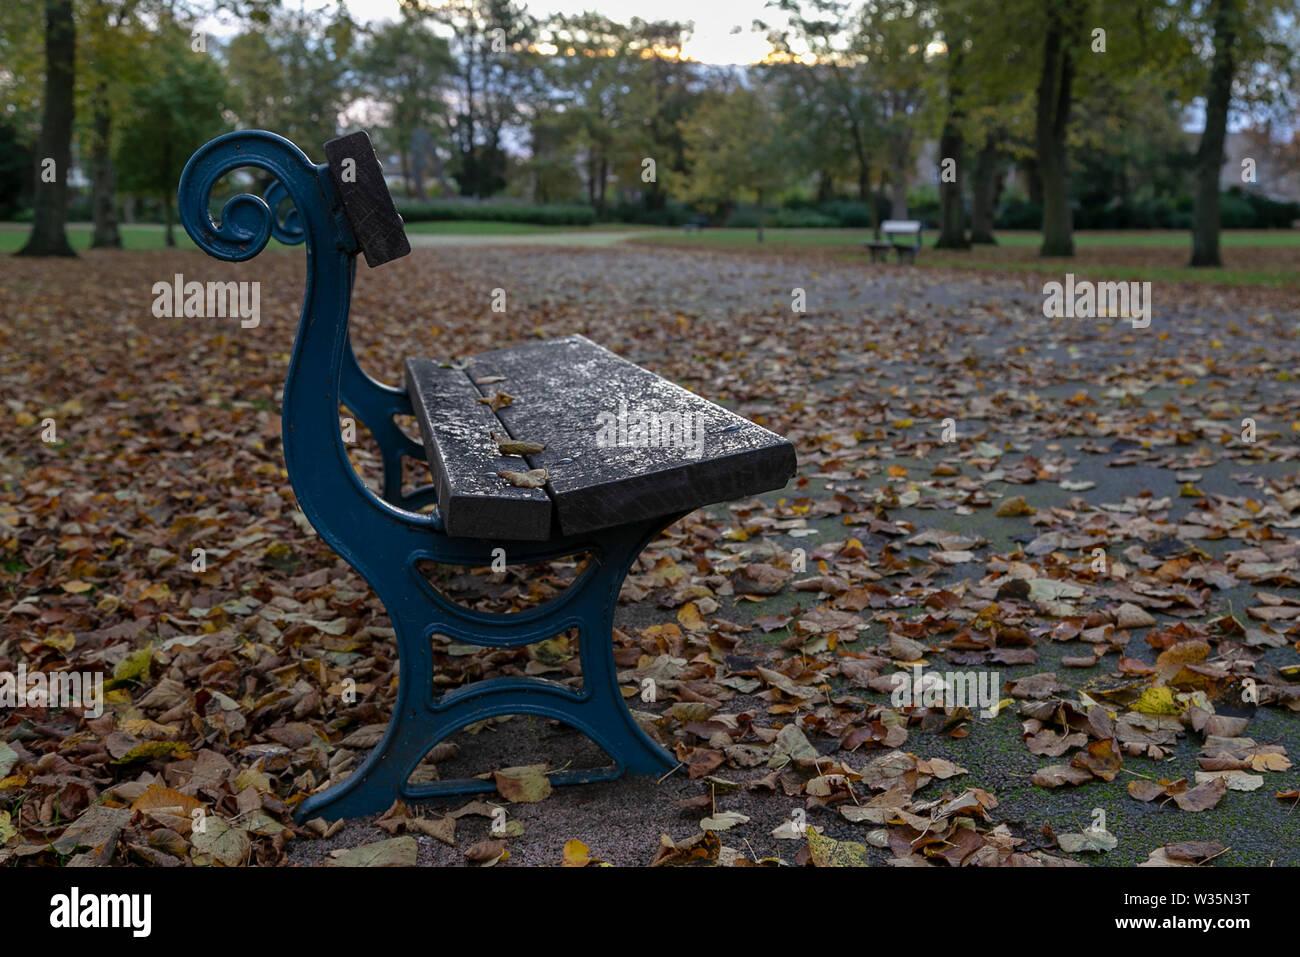 Ropner Park, Stockton on Tees. UK Stock Photo